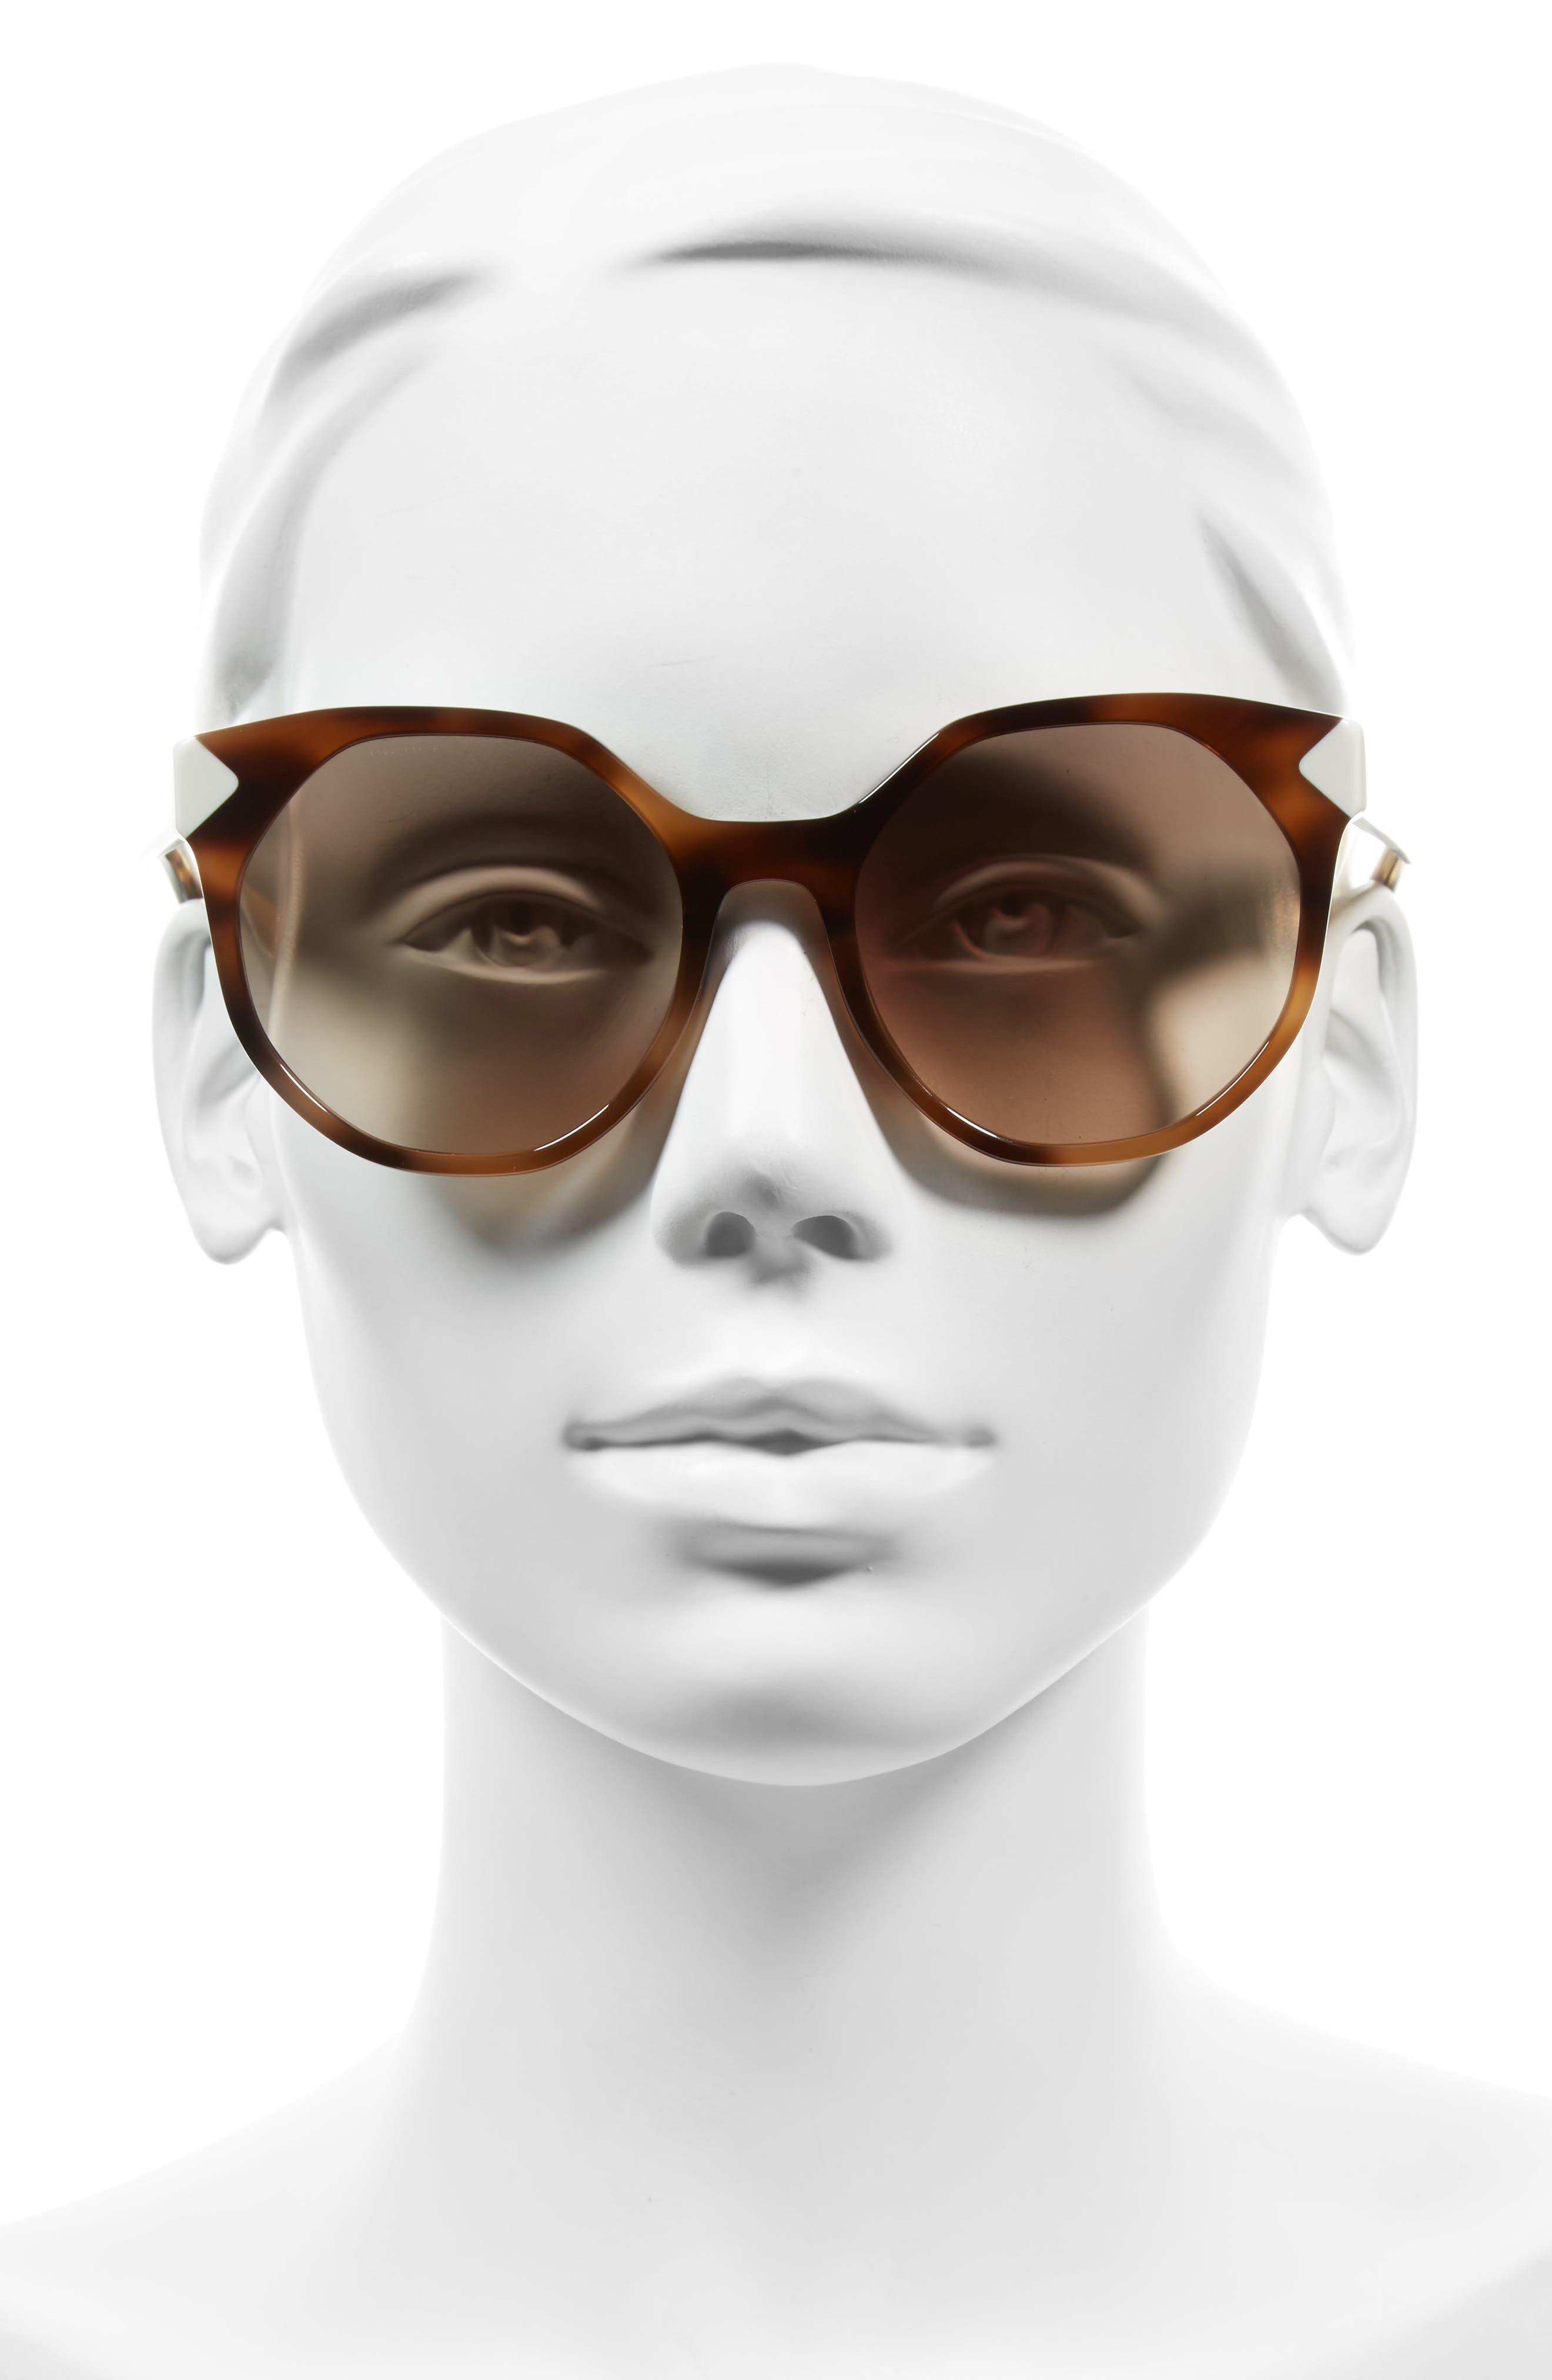 55mm Gradient Geometric Sunglasses,                             Alternate thumbnail 2, color,                             200